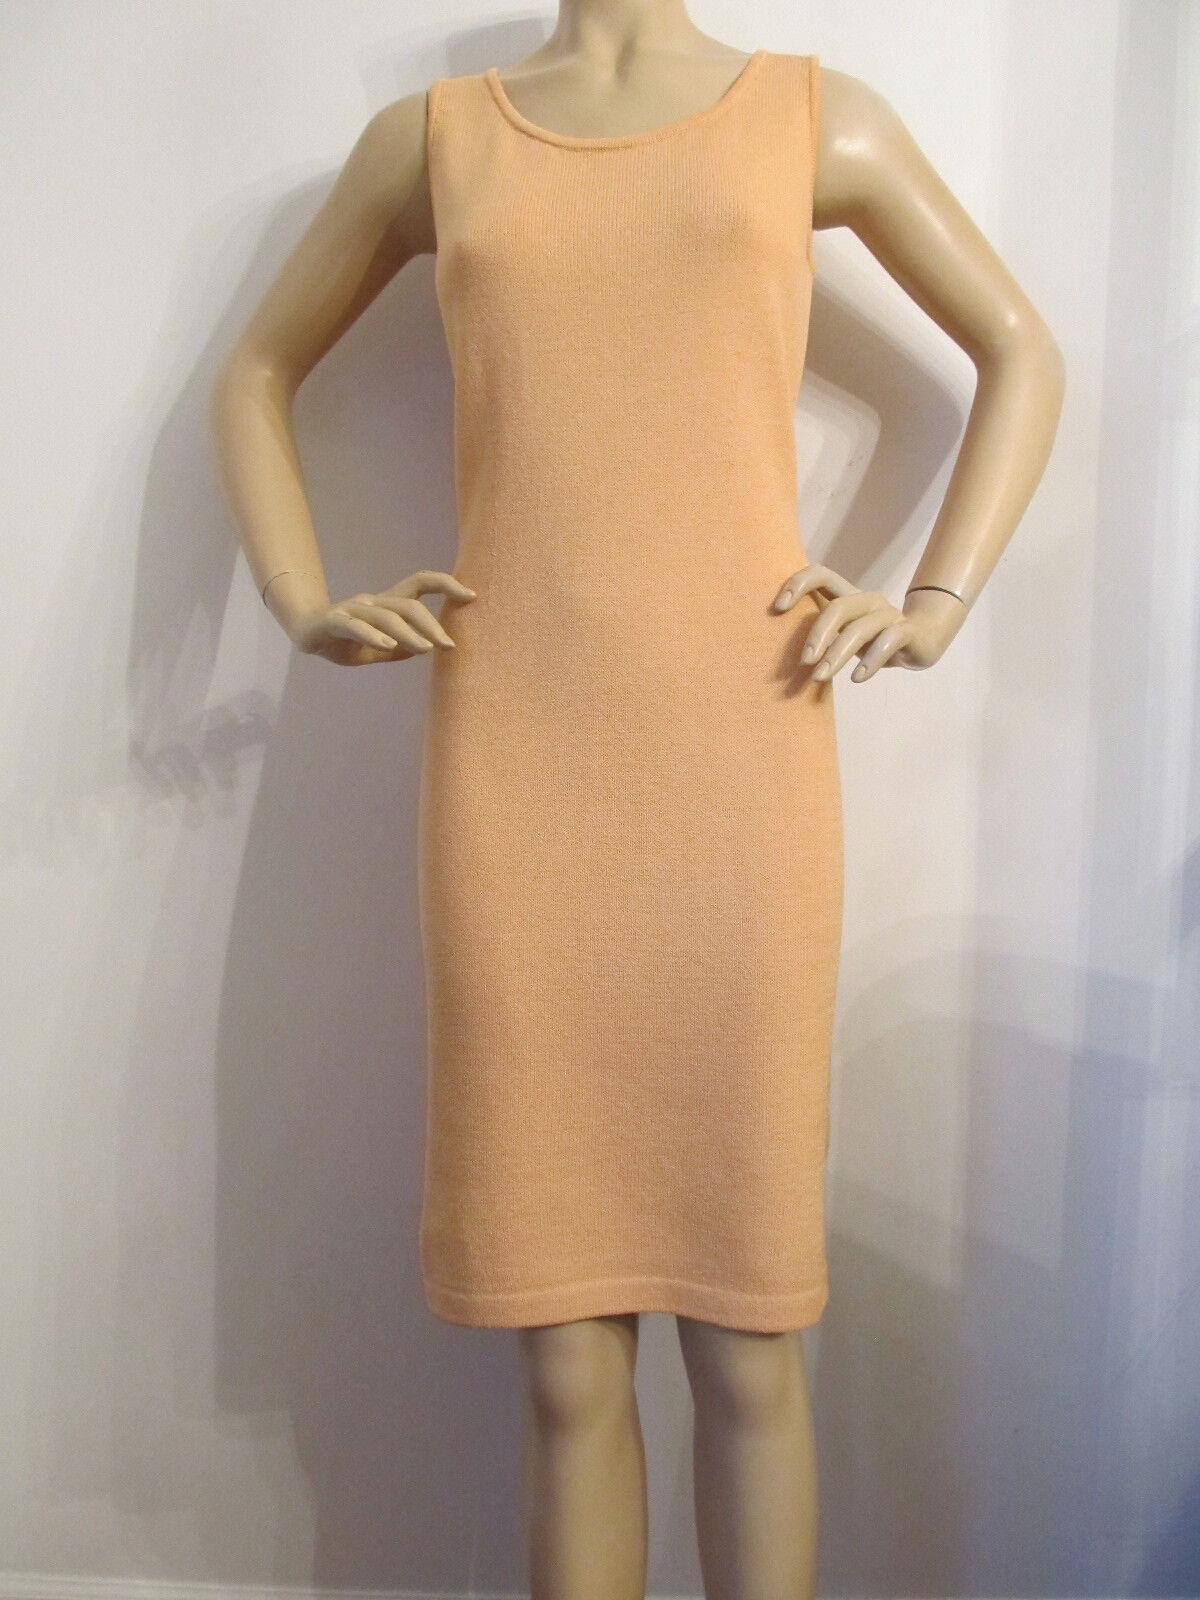 BRAND NEW ST JOHN KNIT SIZE 8 WOMENS DRESS SANTANA KNIT LIGHT PEACH HAZE orange